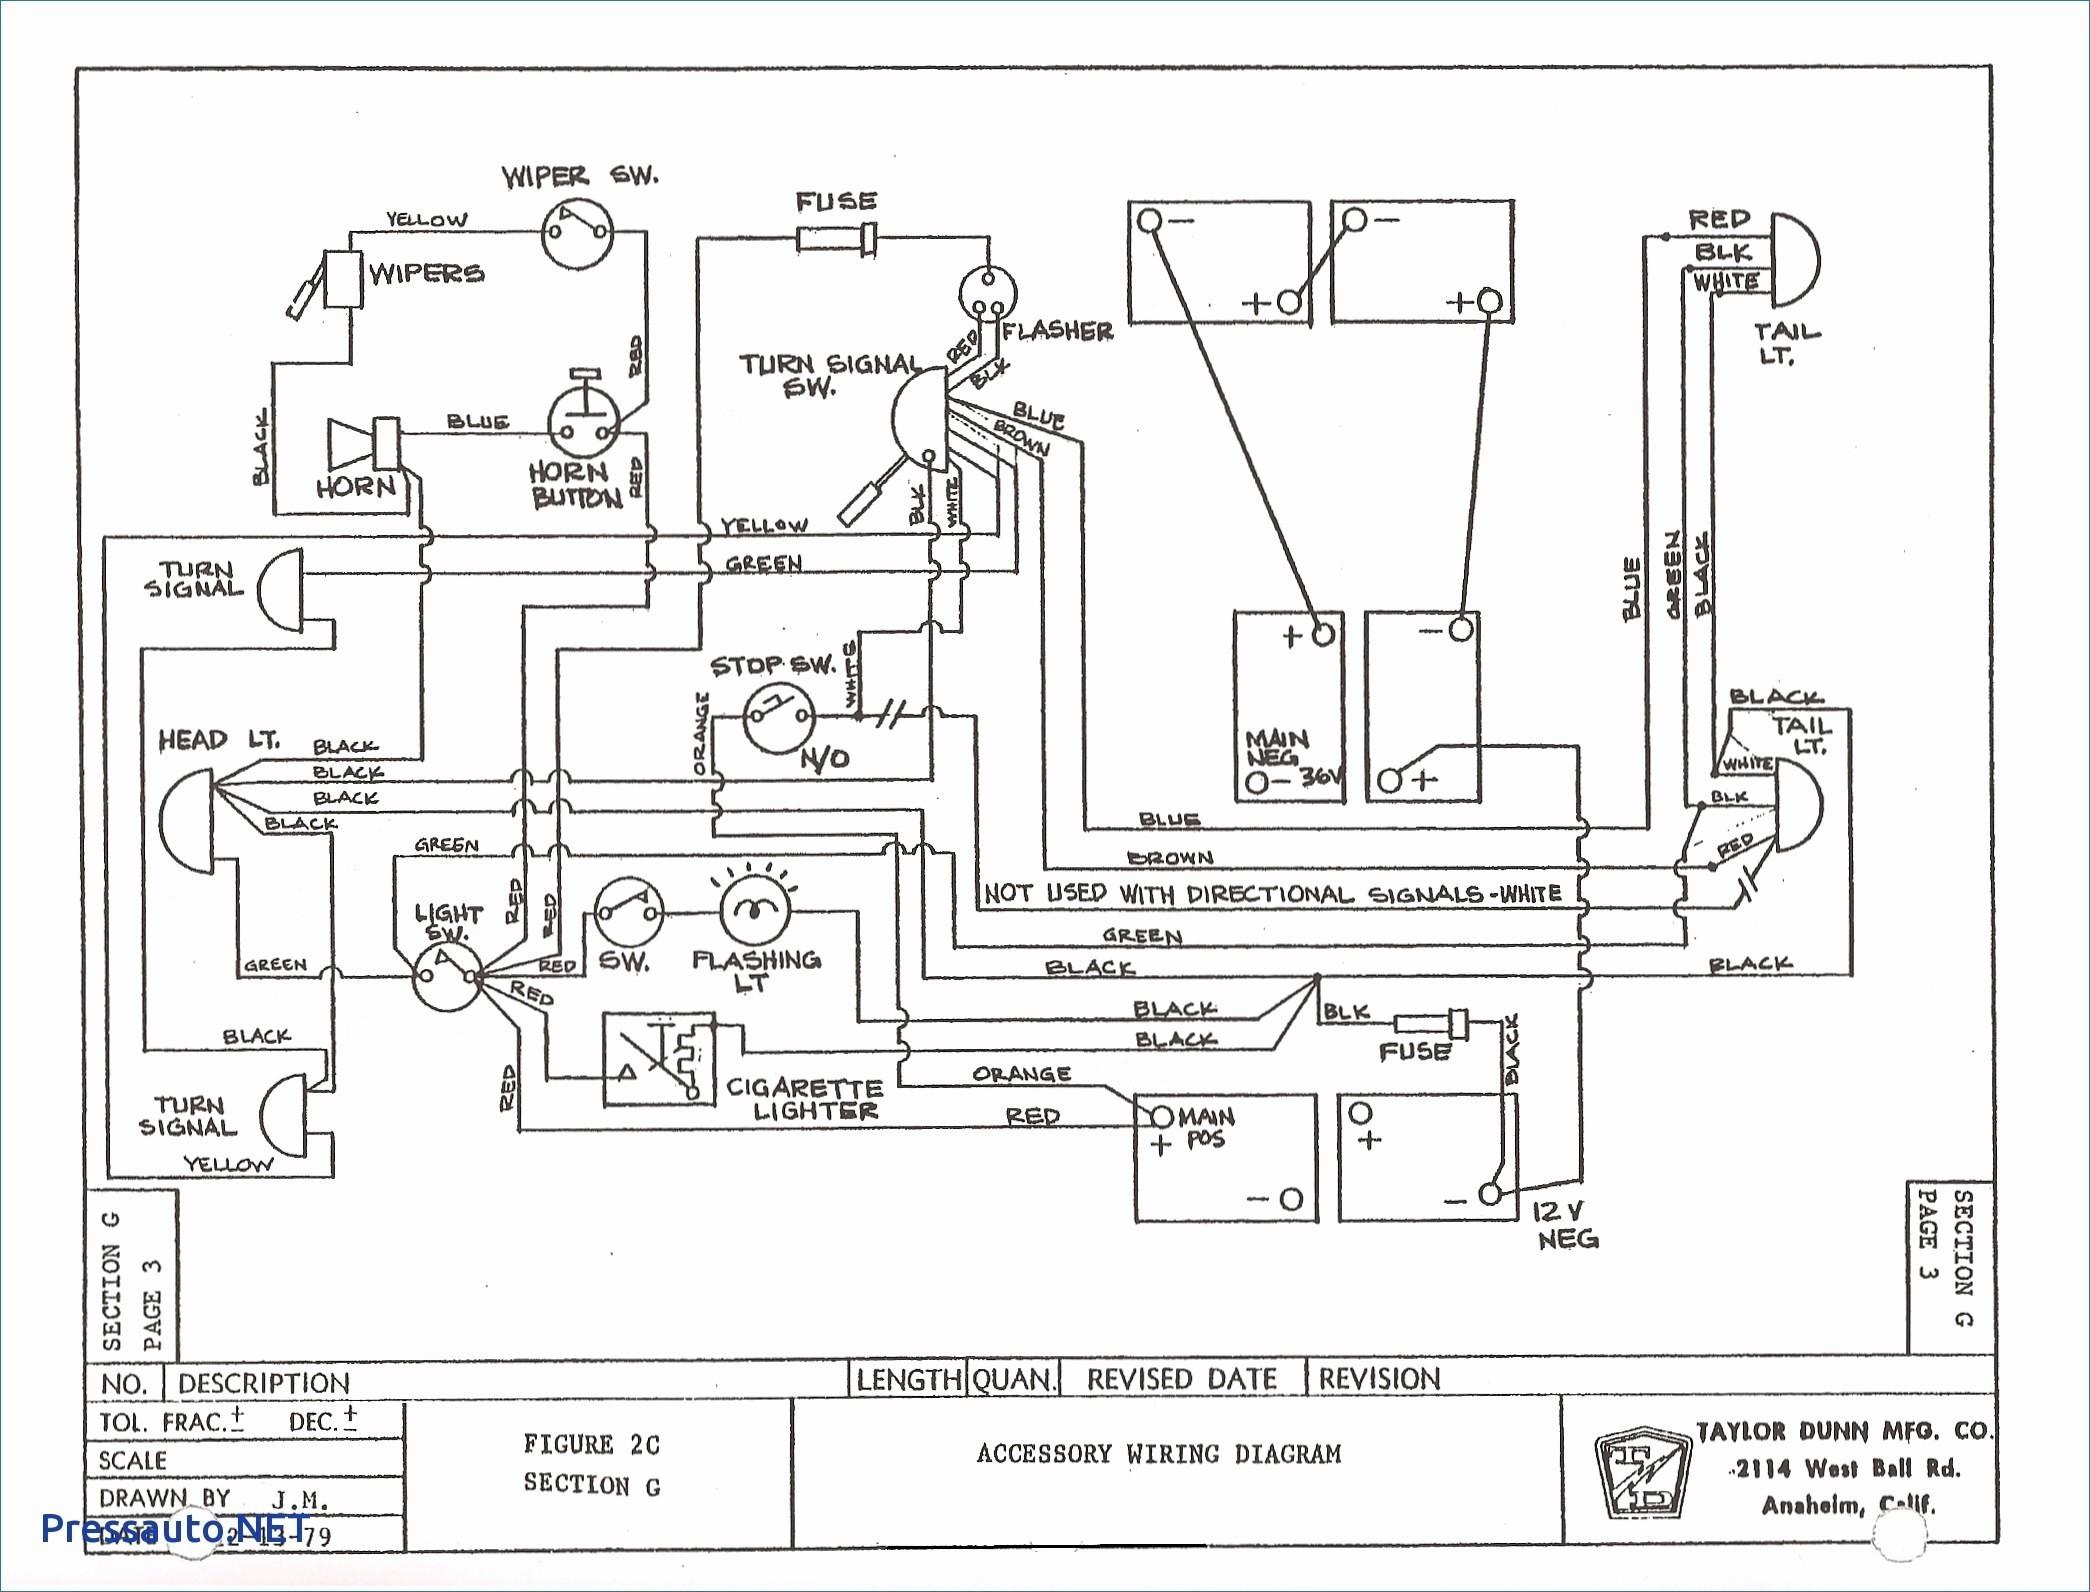 Ezgo Golf Cart Parts Diagram Wiring Diagram 48v Golf Cart Perfect Wiring Diagram Od Rv Park Of Ezgo Golf Cart Parts Diagram